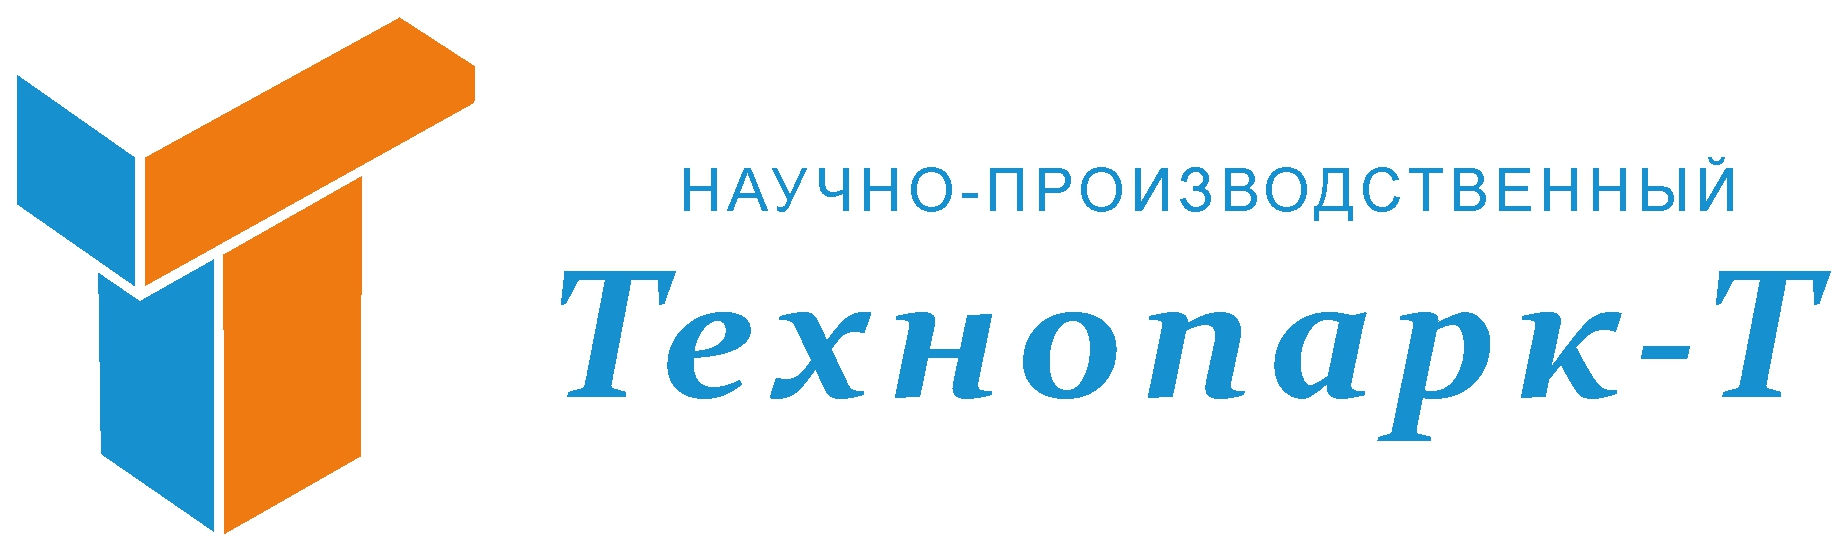 Технопарк-Т